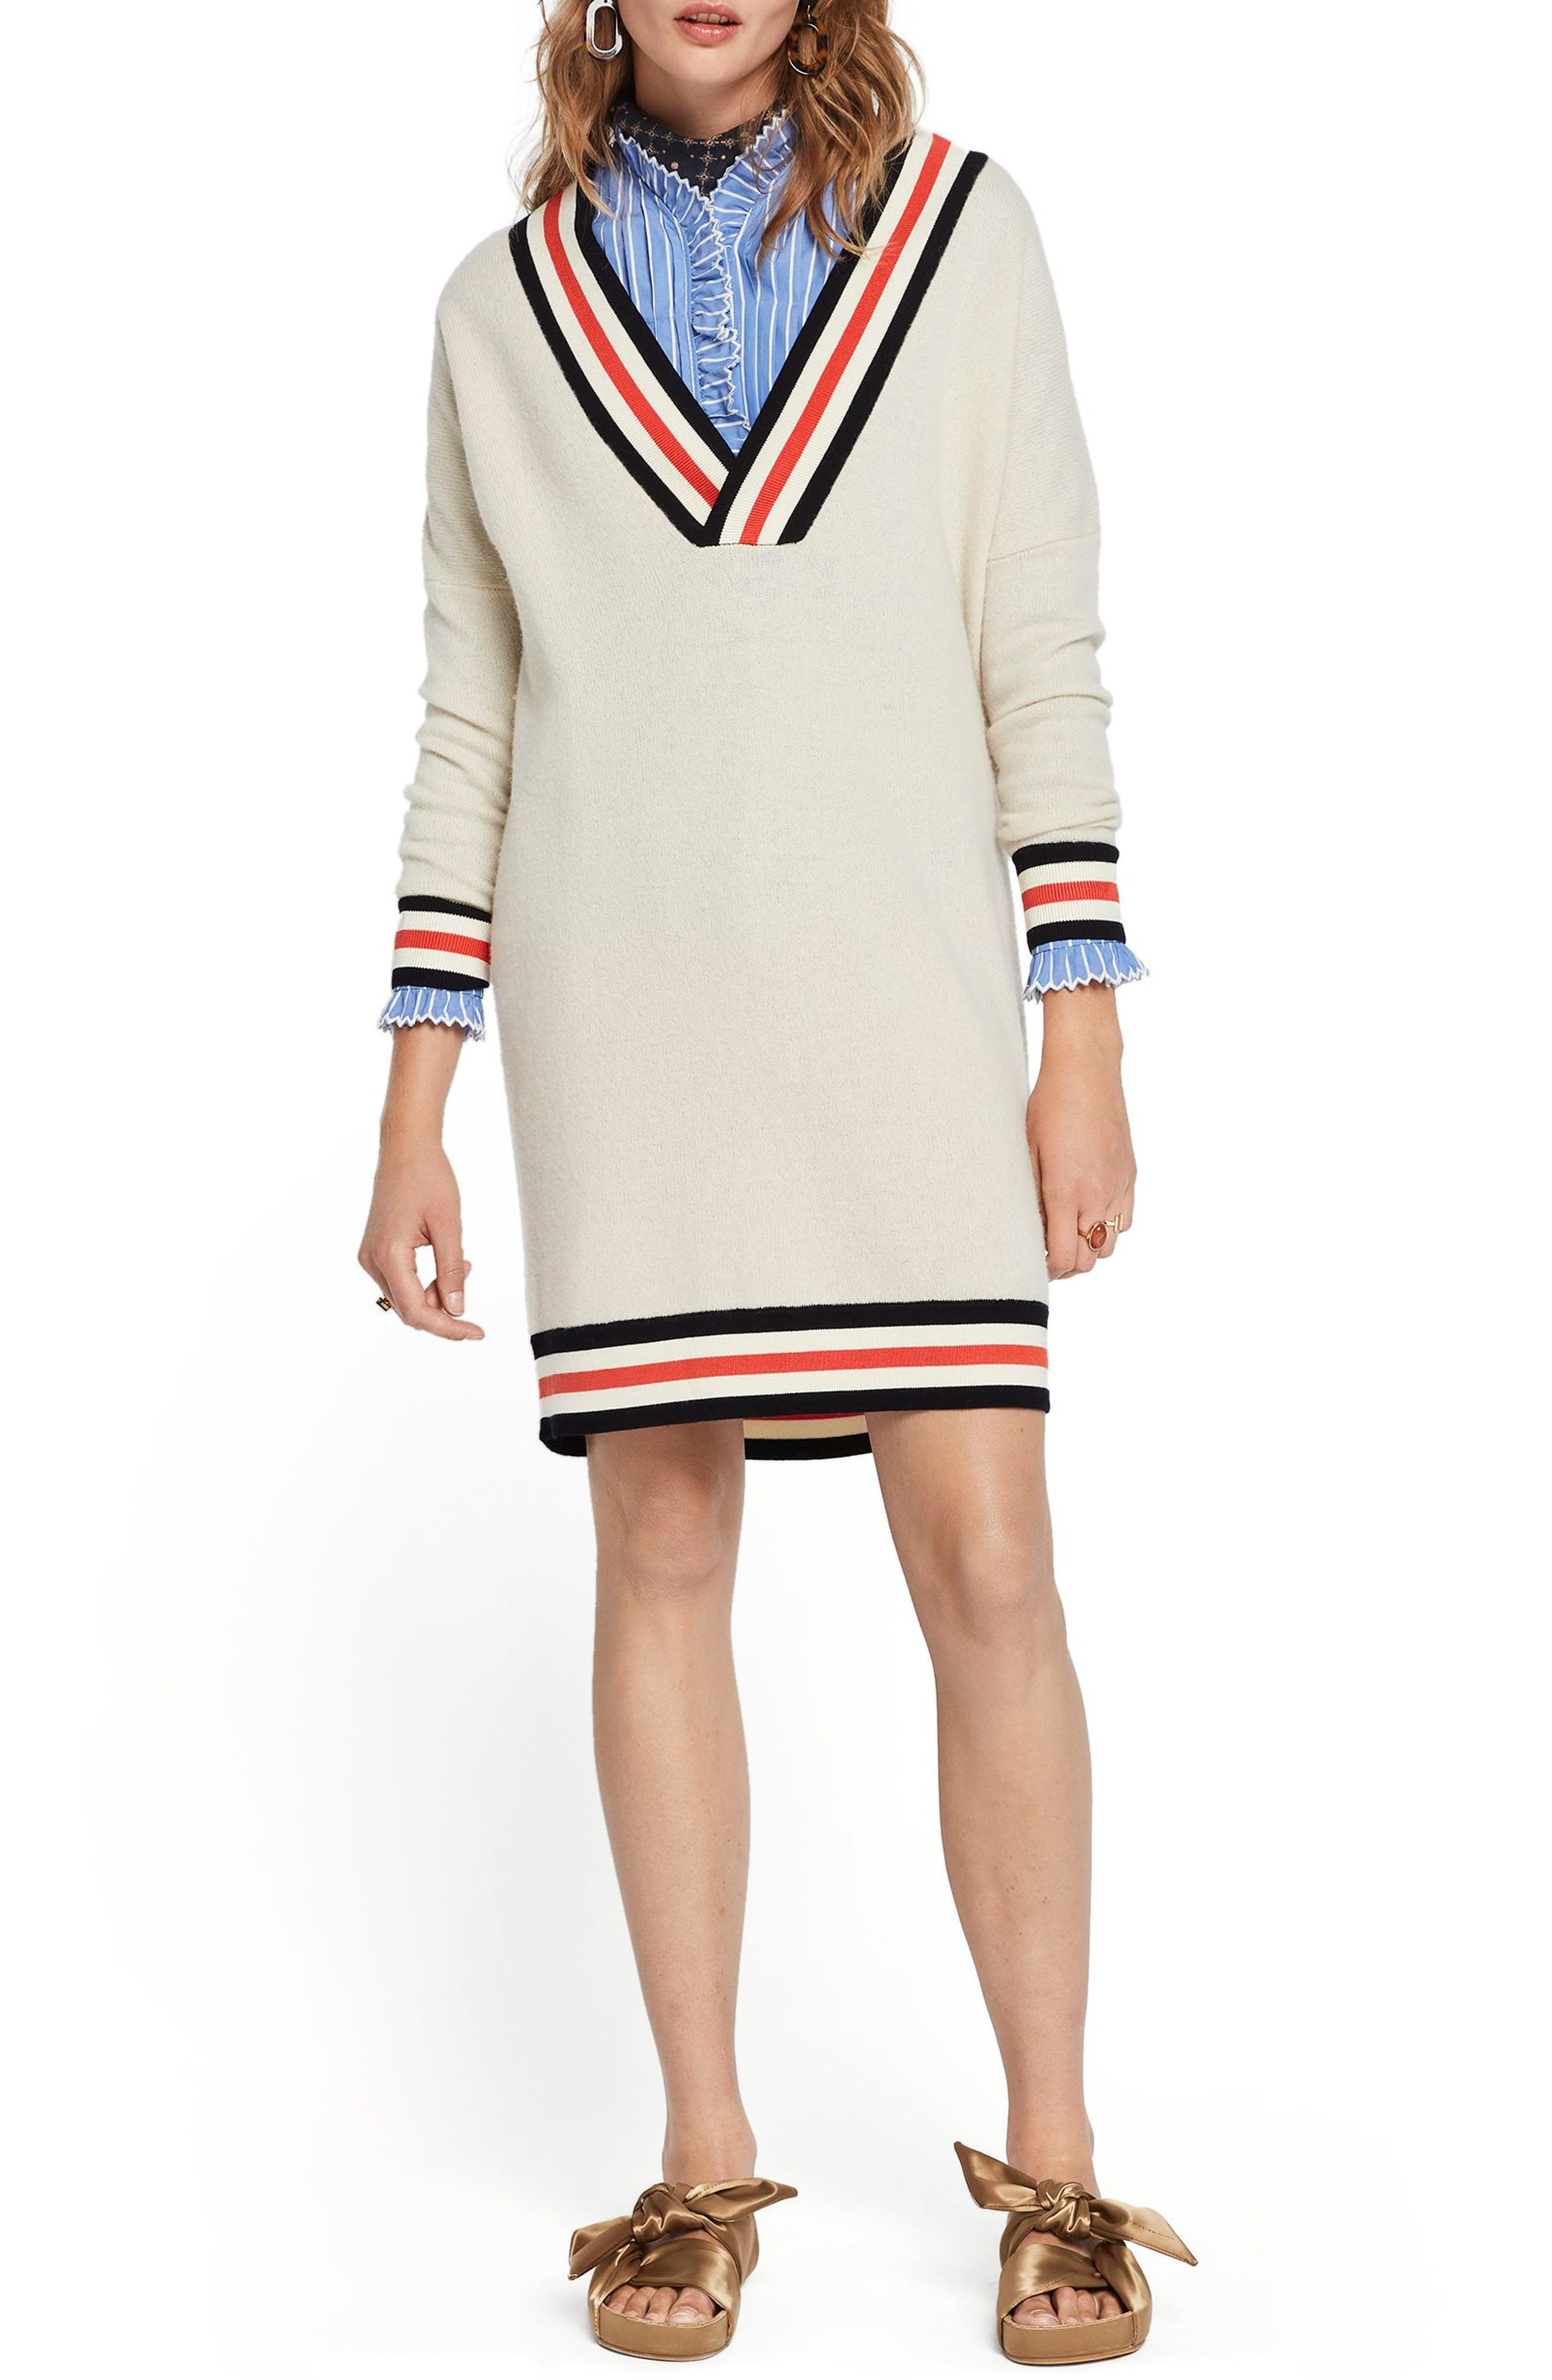 SCOTCH & SODA Luxury Lambswool Longline Sweater, Main, color, 250